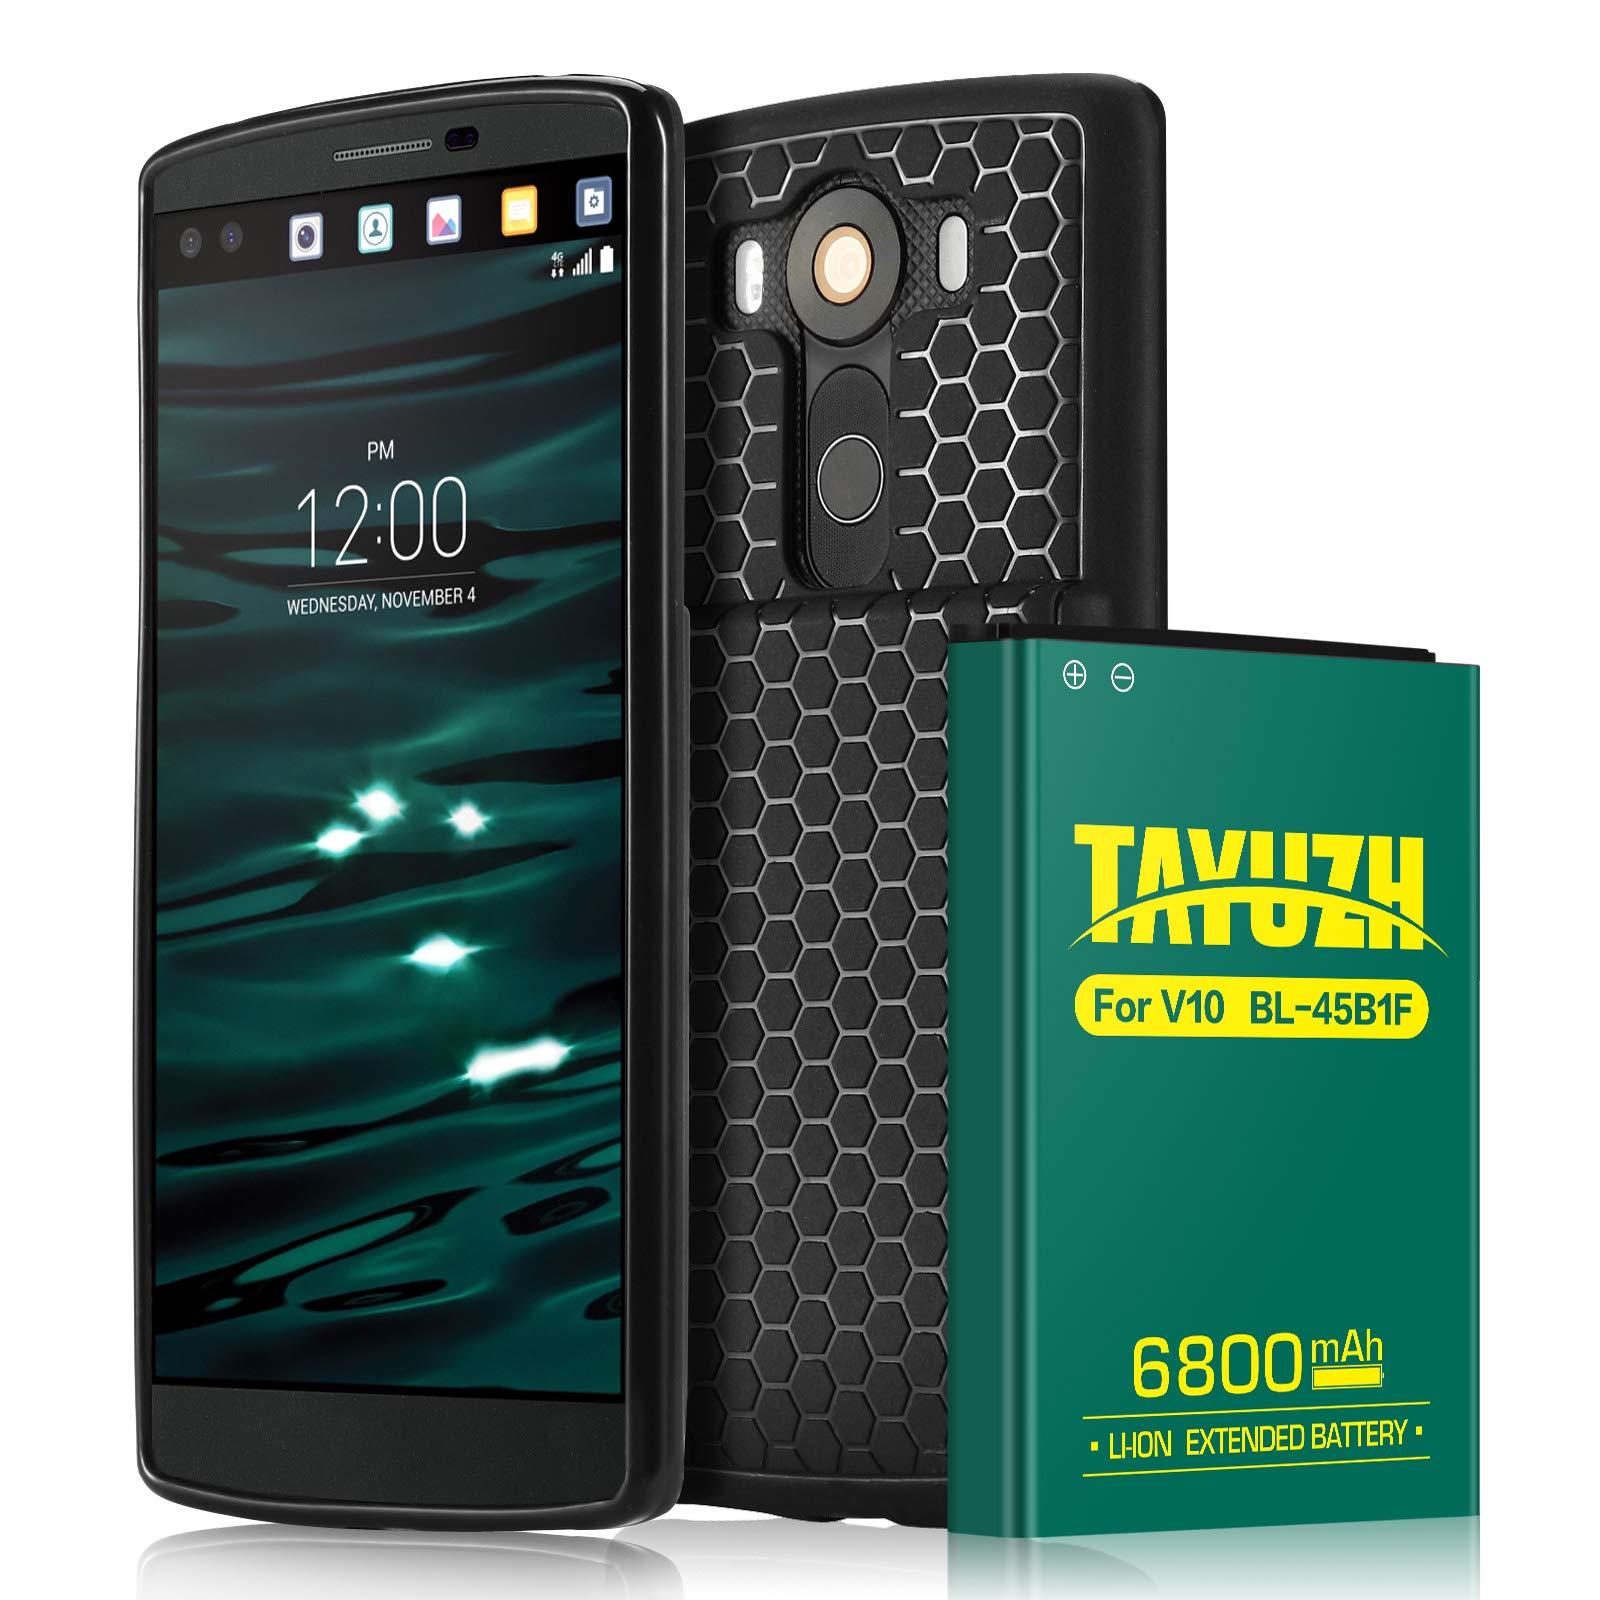 Bateria Celular Lg V10 | Tayuzh 6800mah Li Ion Lg V10 Extended Con Back Cover & Soft Tpu Protective Case Para Lg Bl 45b1